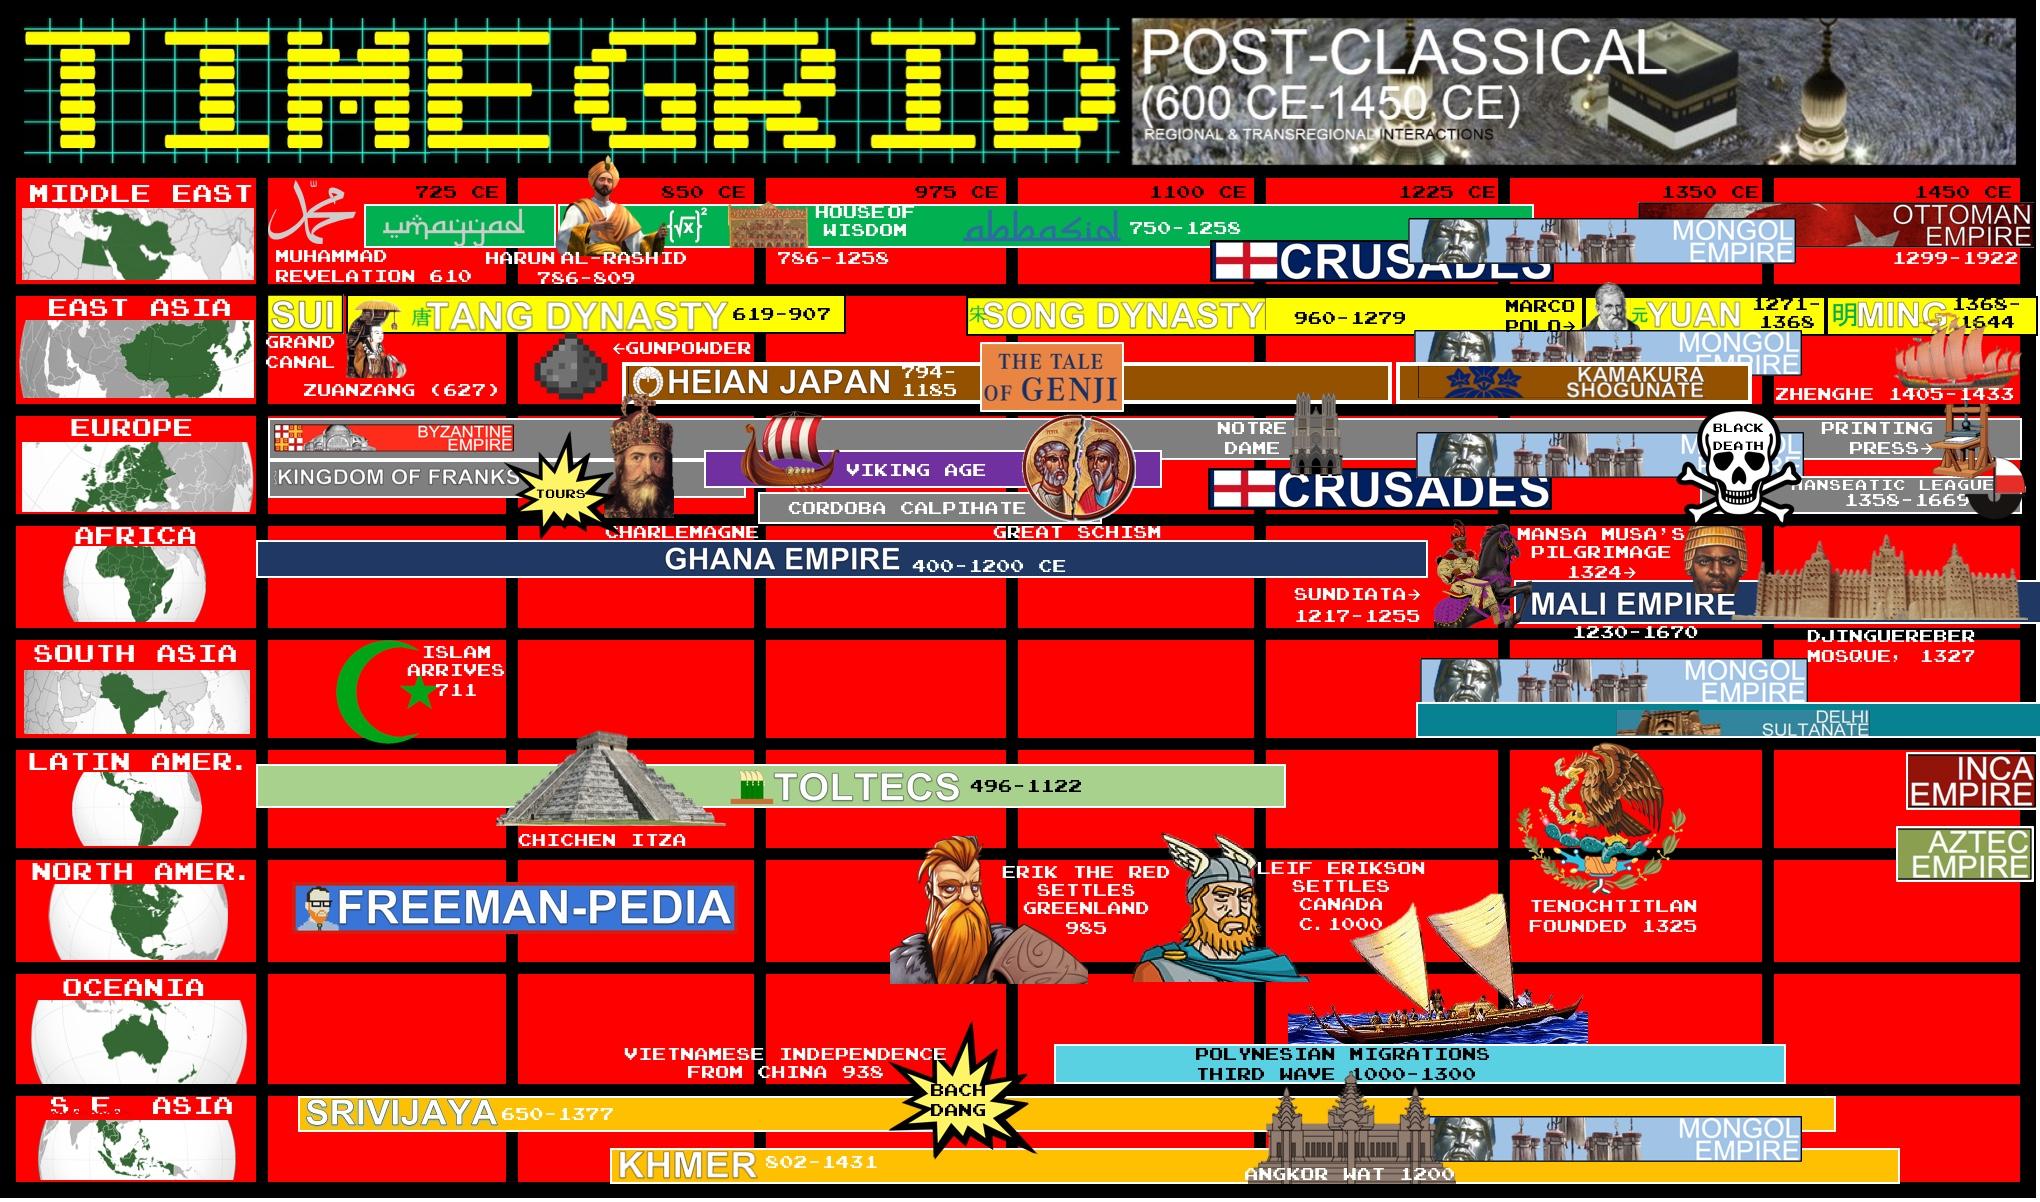 TIMEGRID POSTCLASSICAL AP WORLD HISTORY FREEMANPEDIA.jpeg